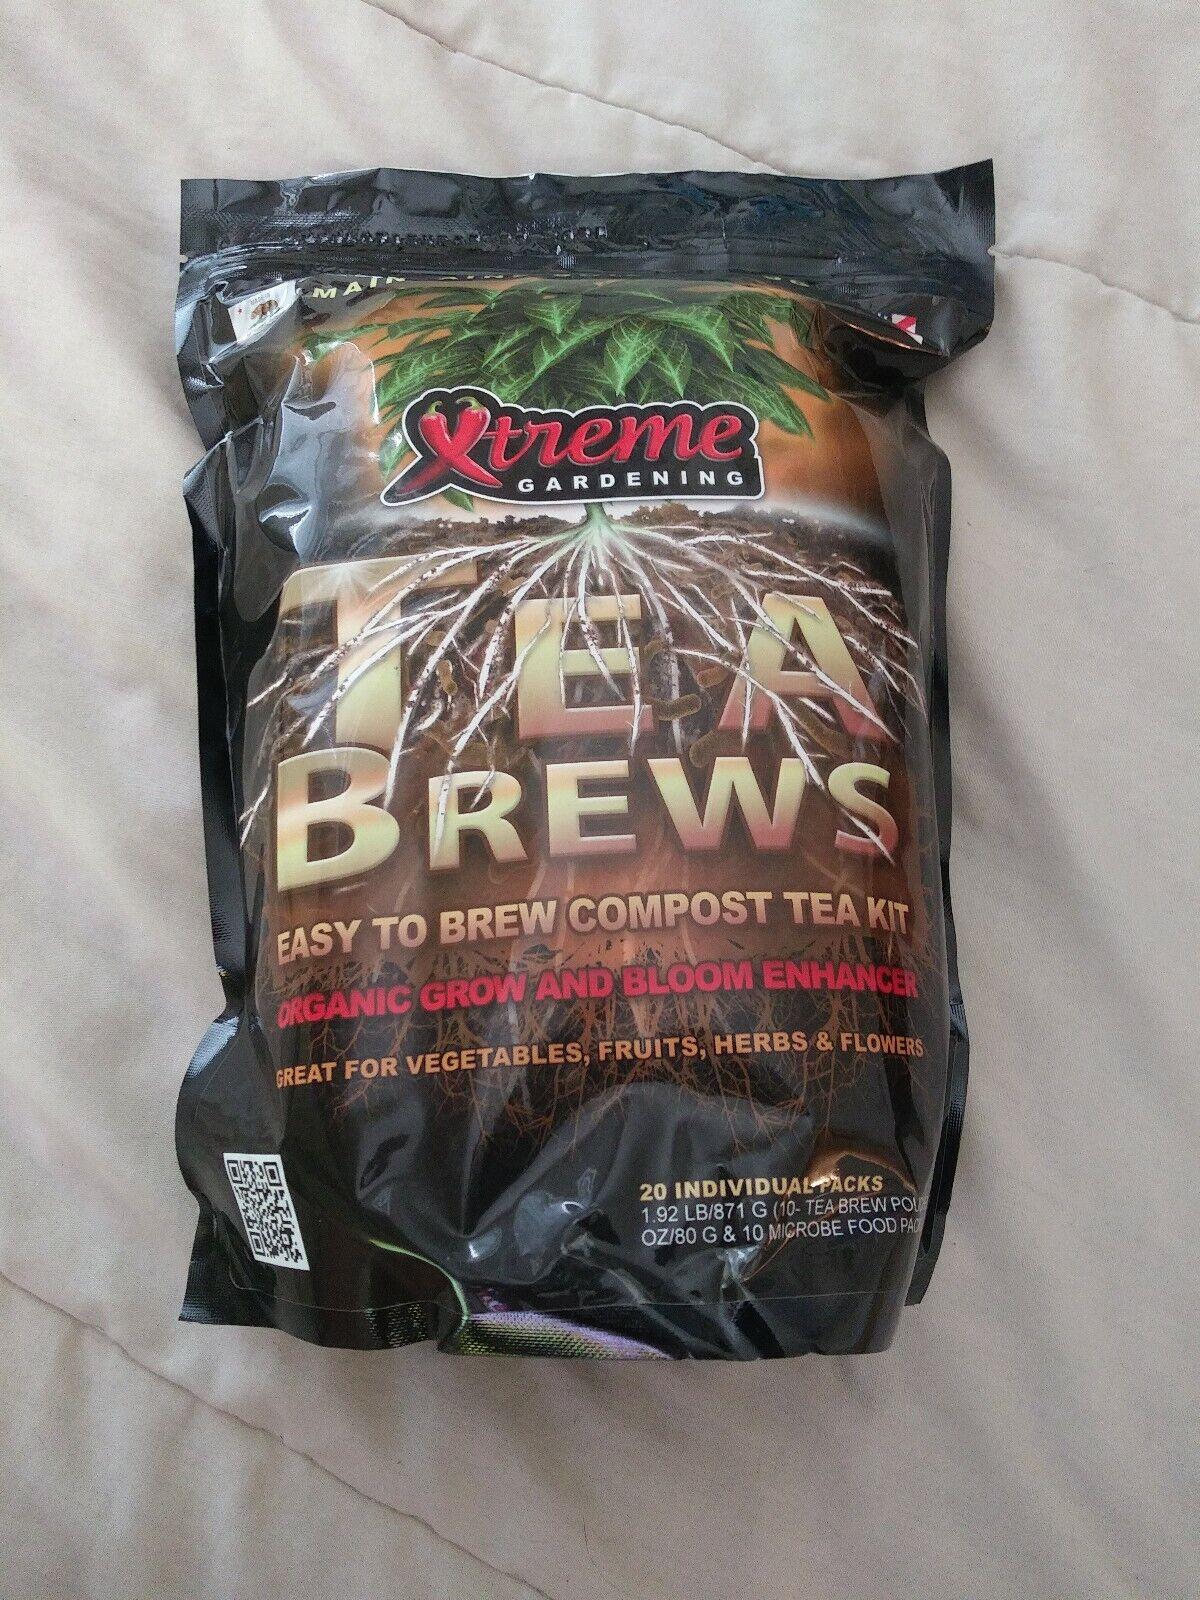 Xtreme Jardinería Té Brews 10g paquetes 10 ct raíces Omri Mykos azos Compost